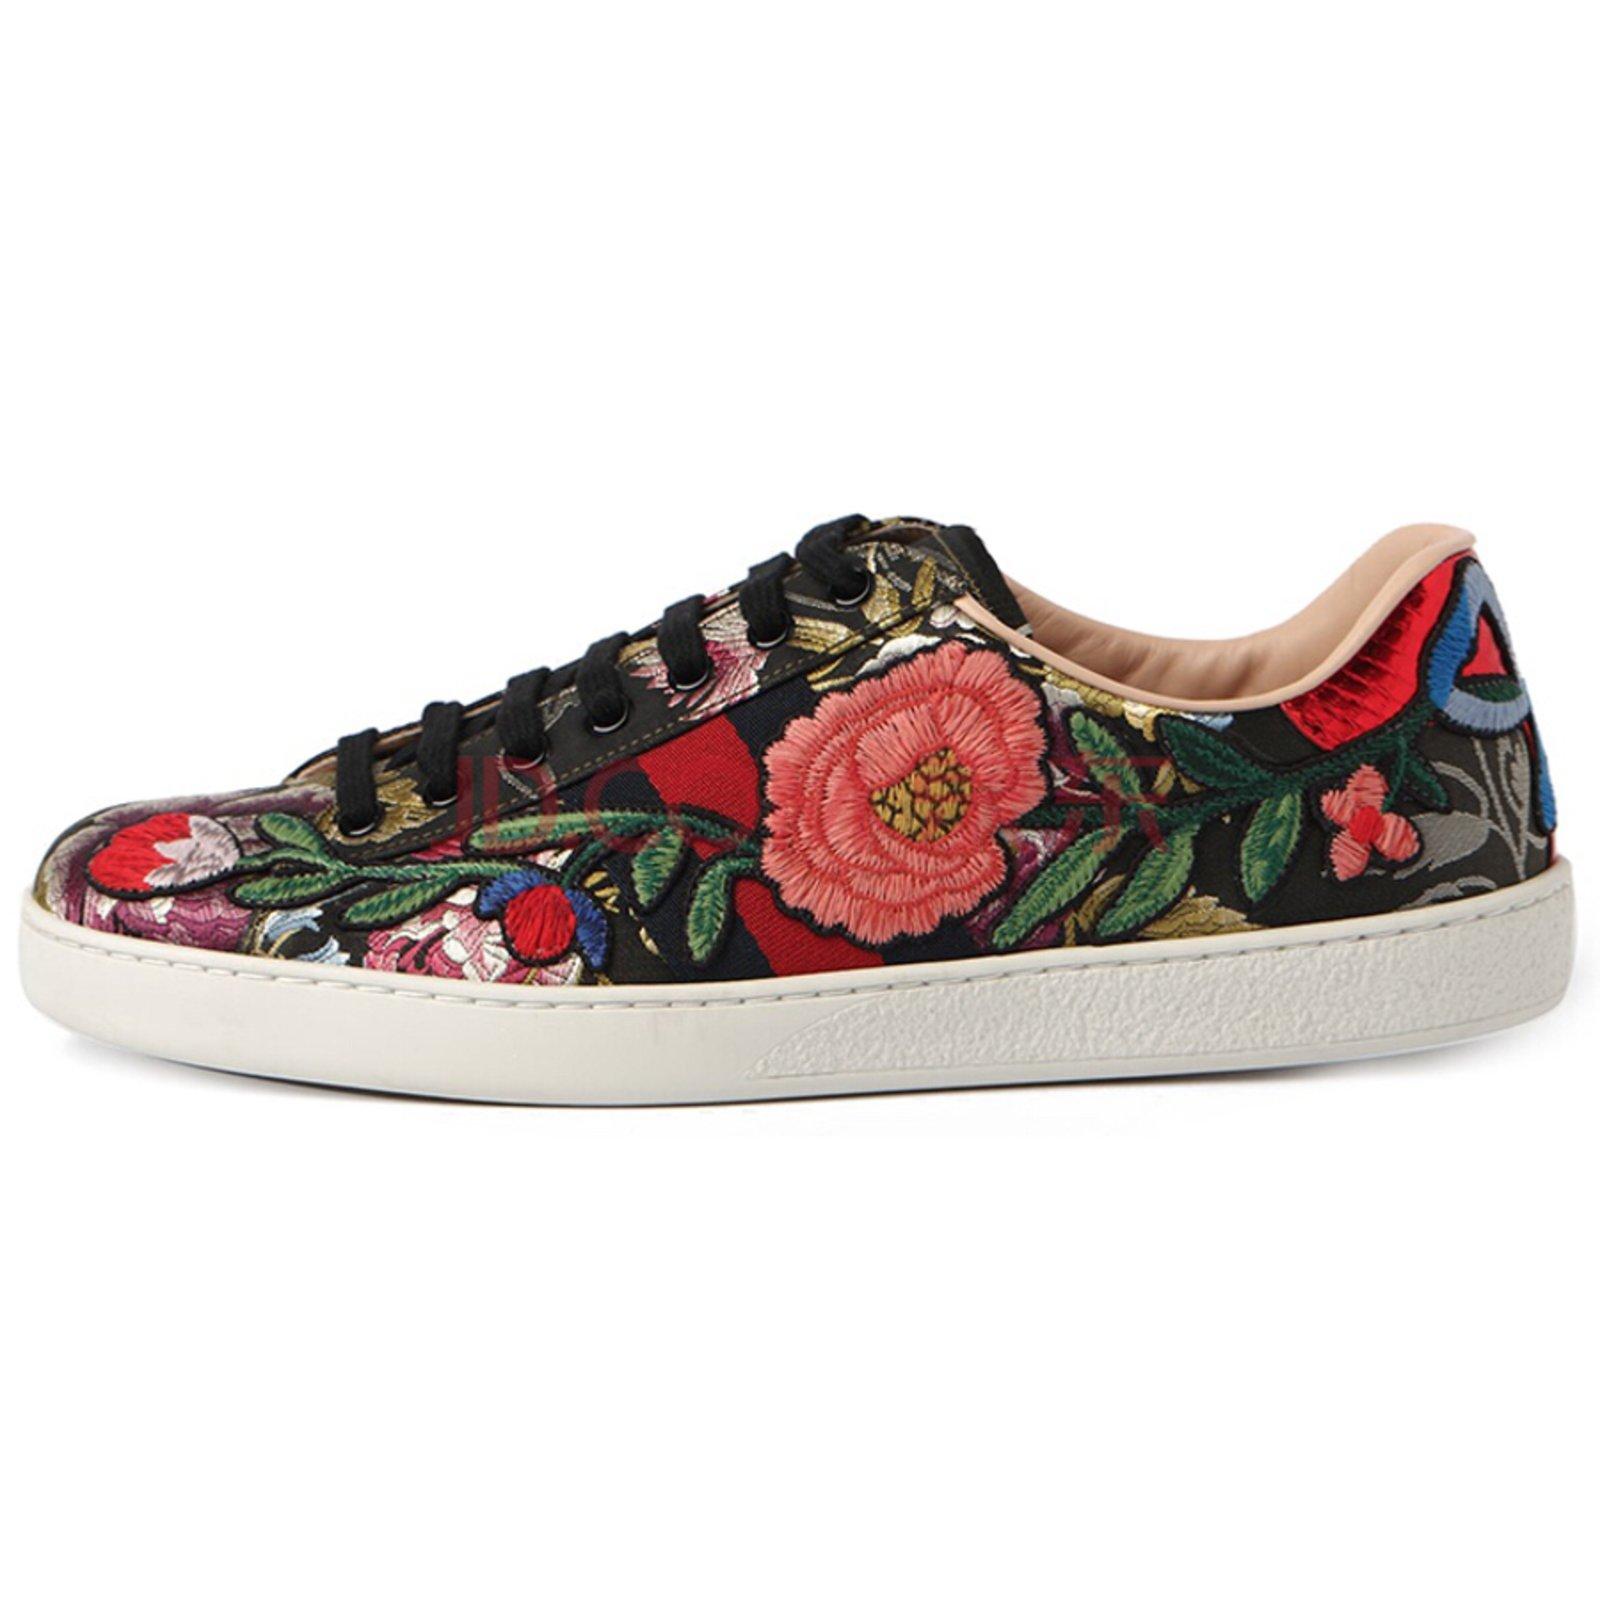 Gucci gucci sneakers flowers new 41 eu